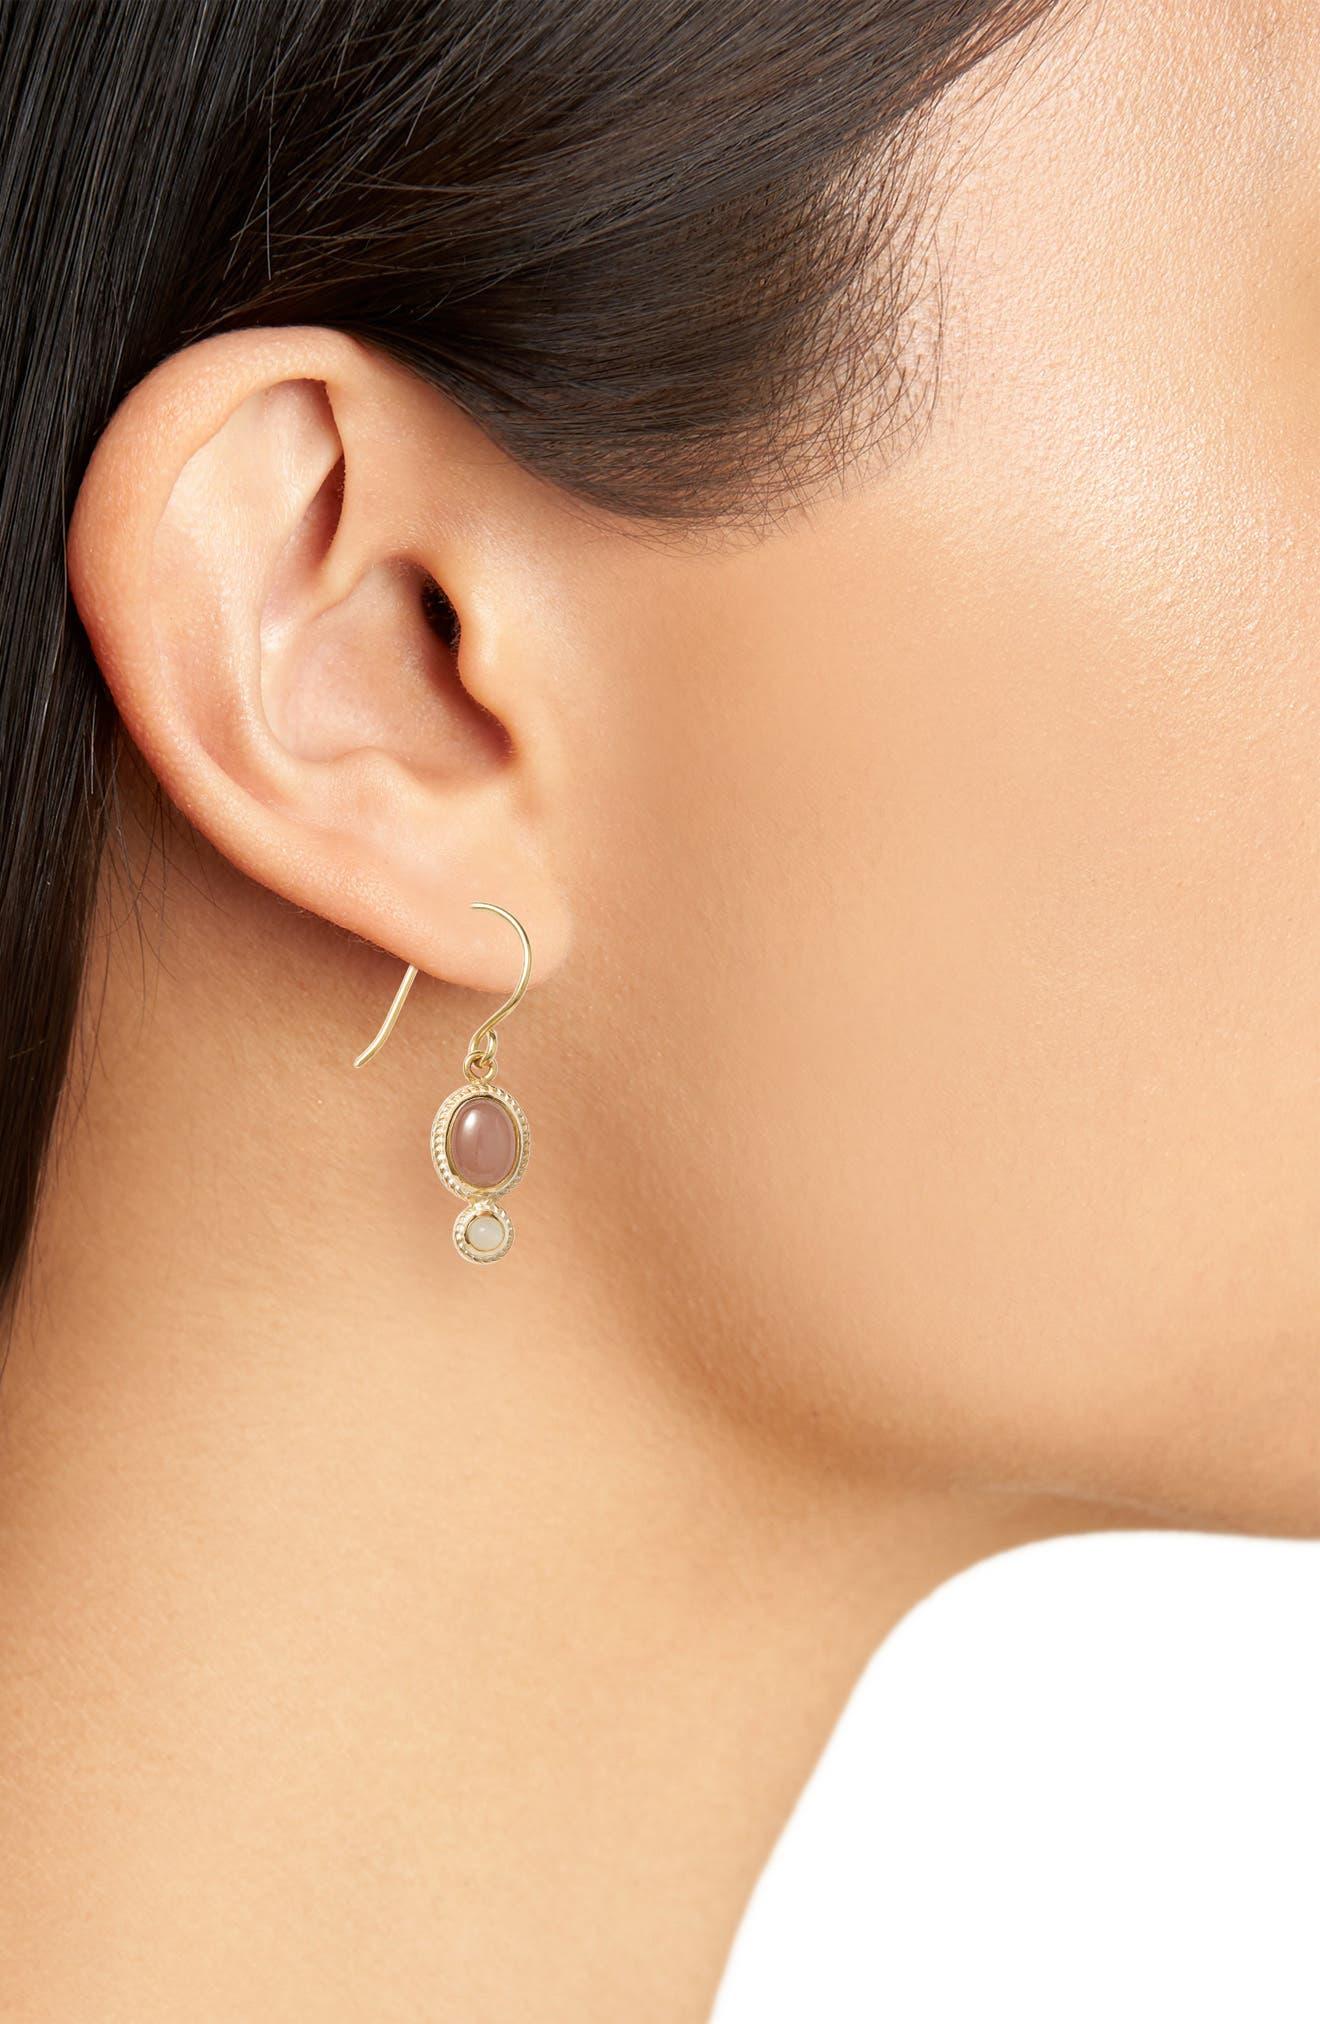 Guava Quartz & Moonstone Drop Earrings,                             Alternate thumbnail 2, color,                             950